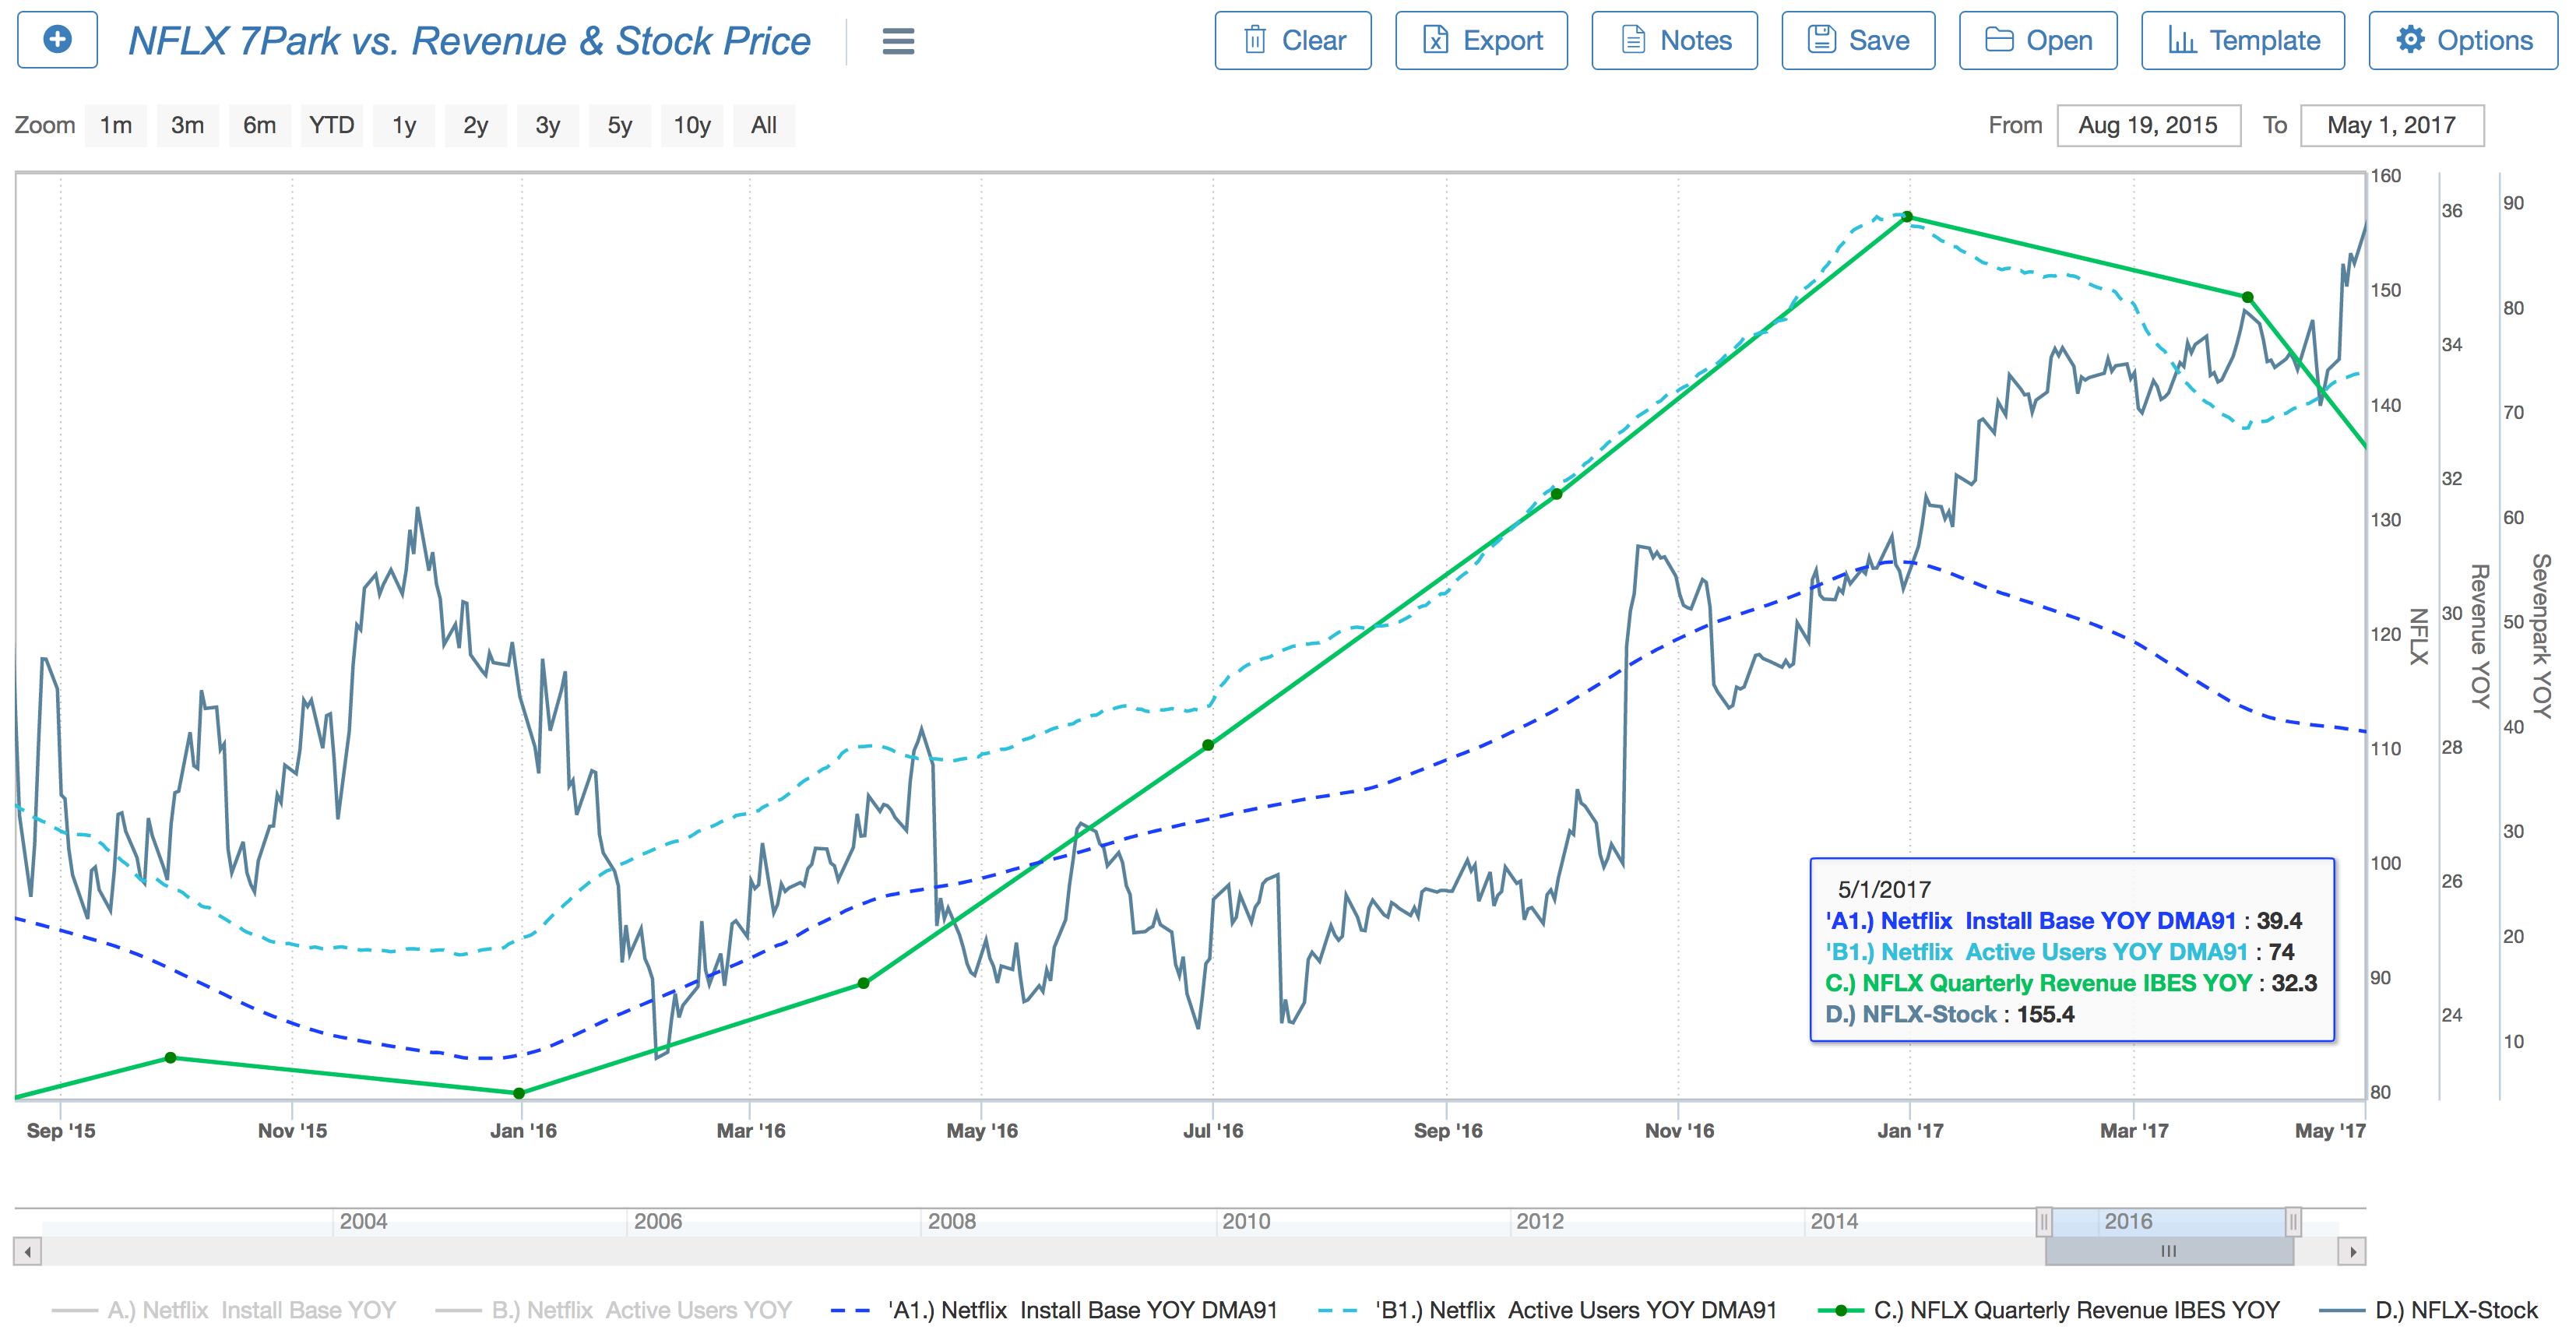 Skx Stock Quote Alternative Data  Sentieo